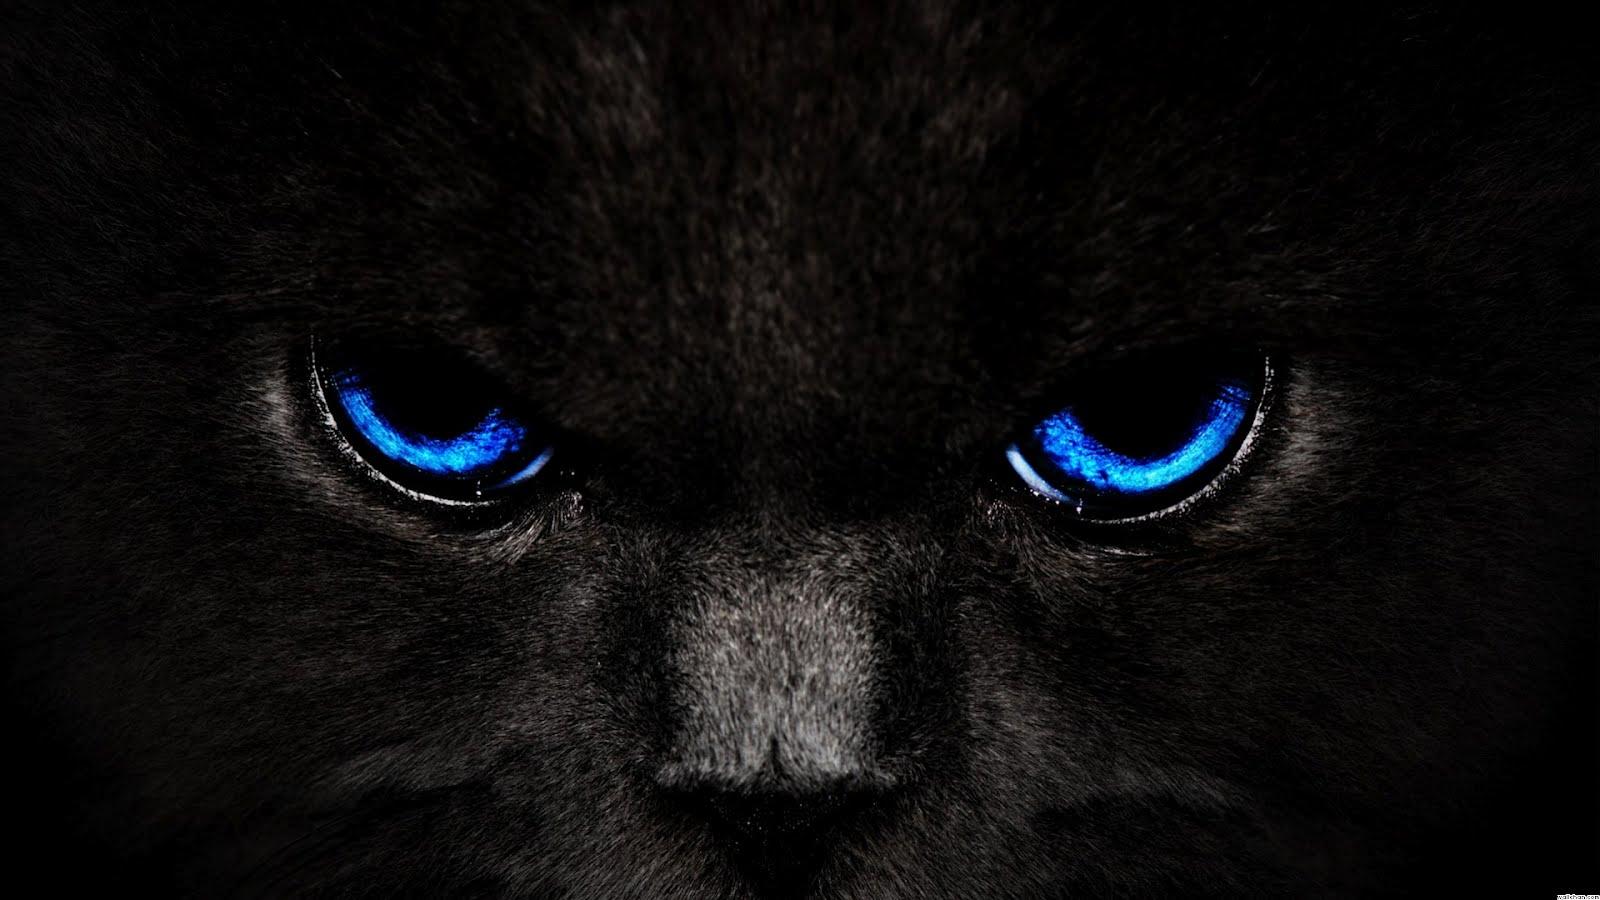 red cat eyes wallpaper - photo #9